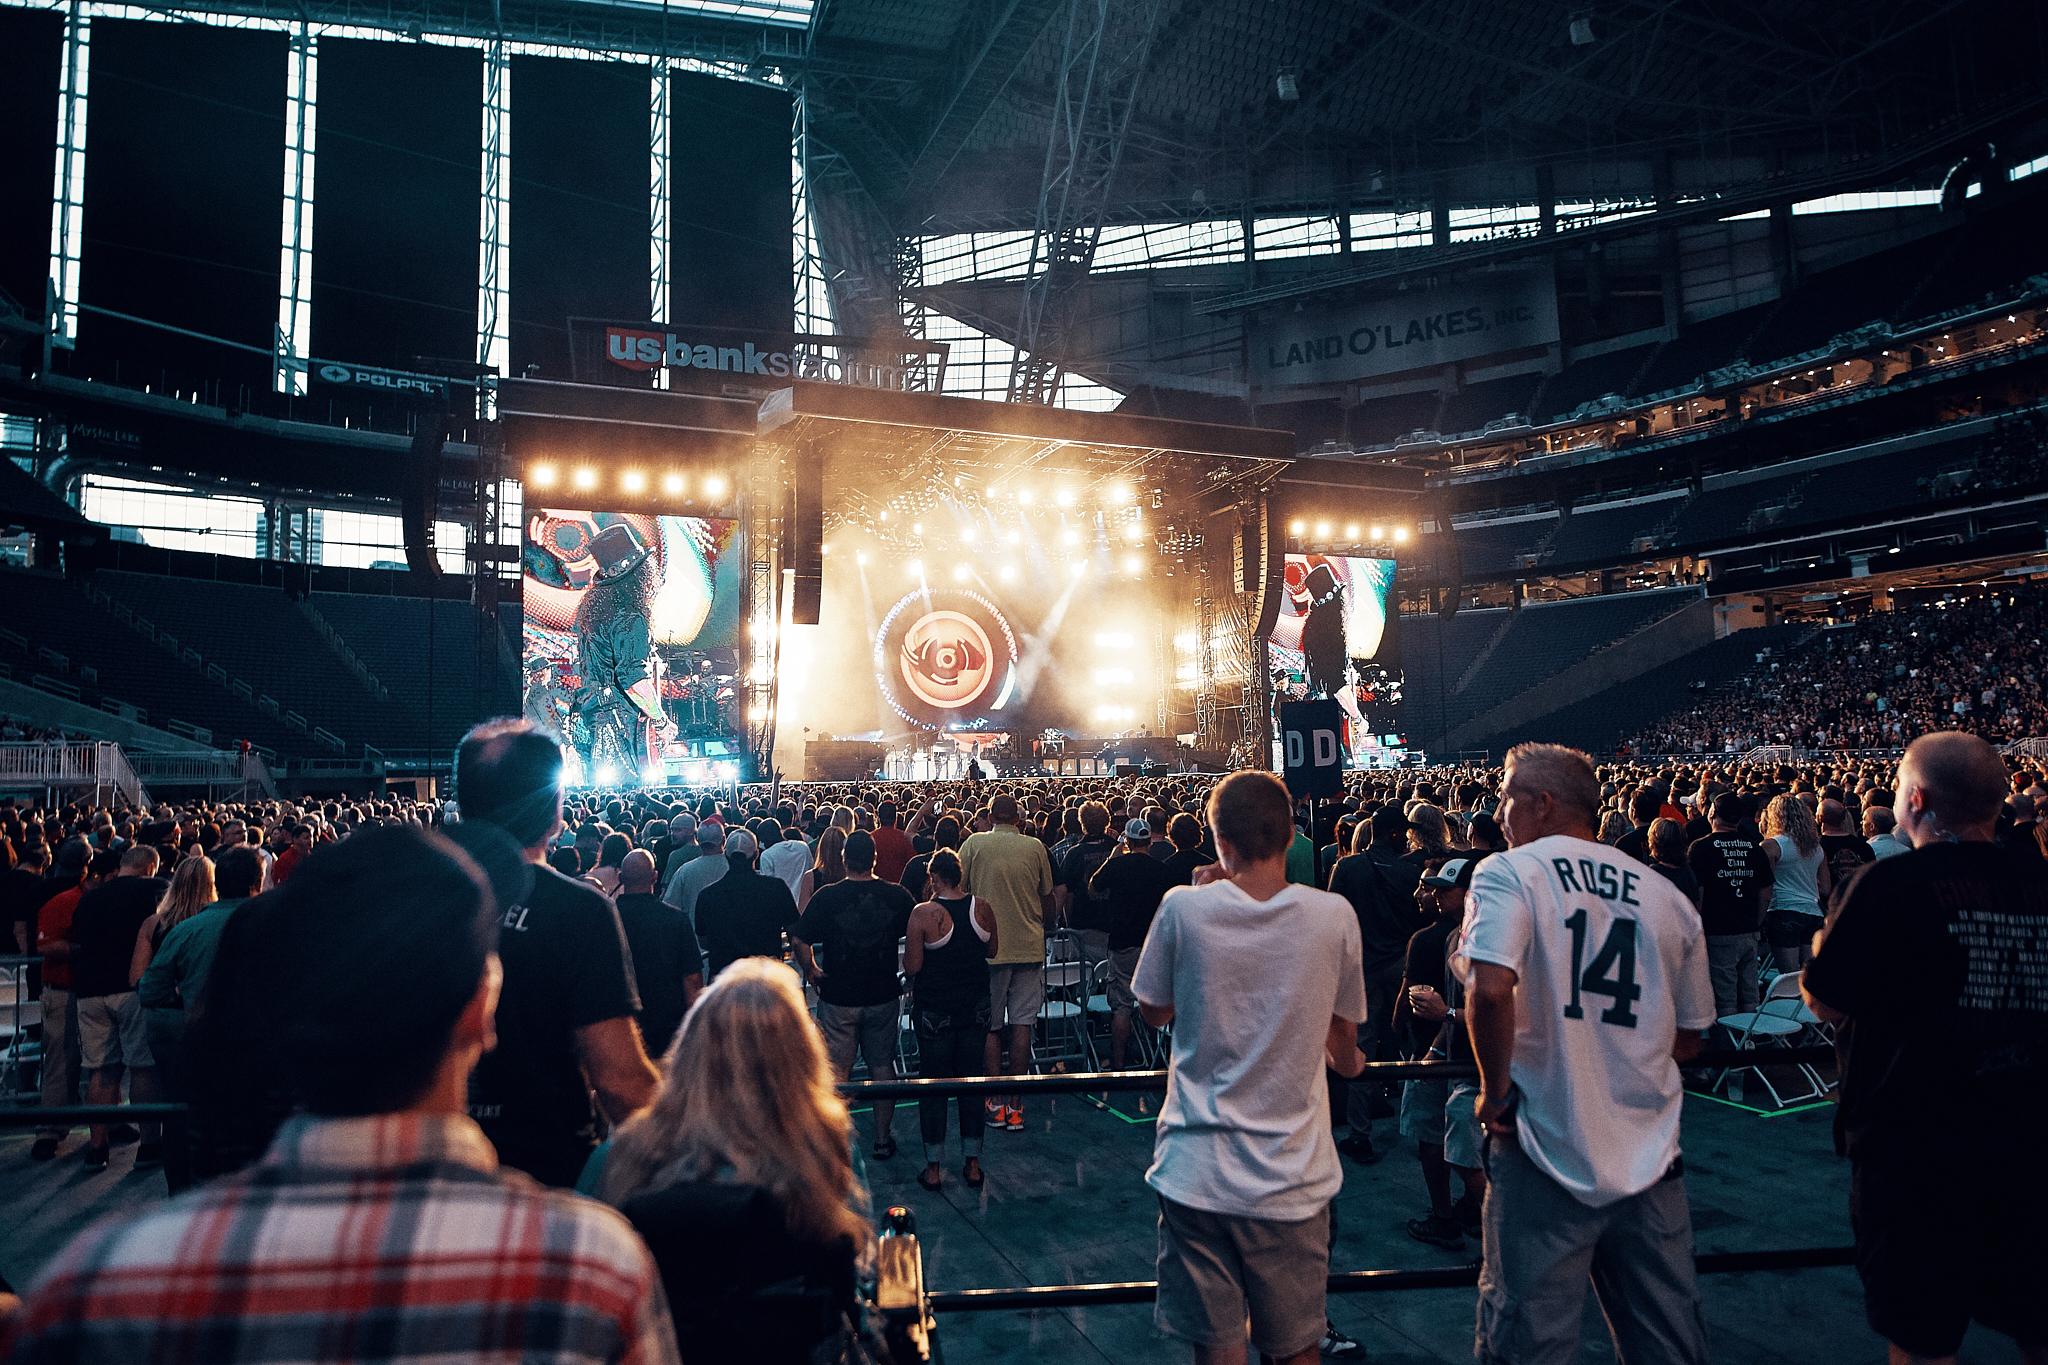 Guns_N_Roses_US_Bank_Stadium_Minneapolis_Minnesota_Photography_By_Joe_Lemke_030.JPG